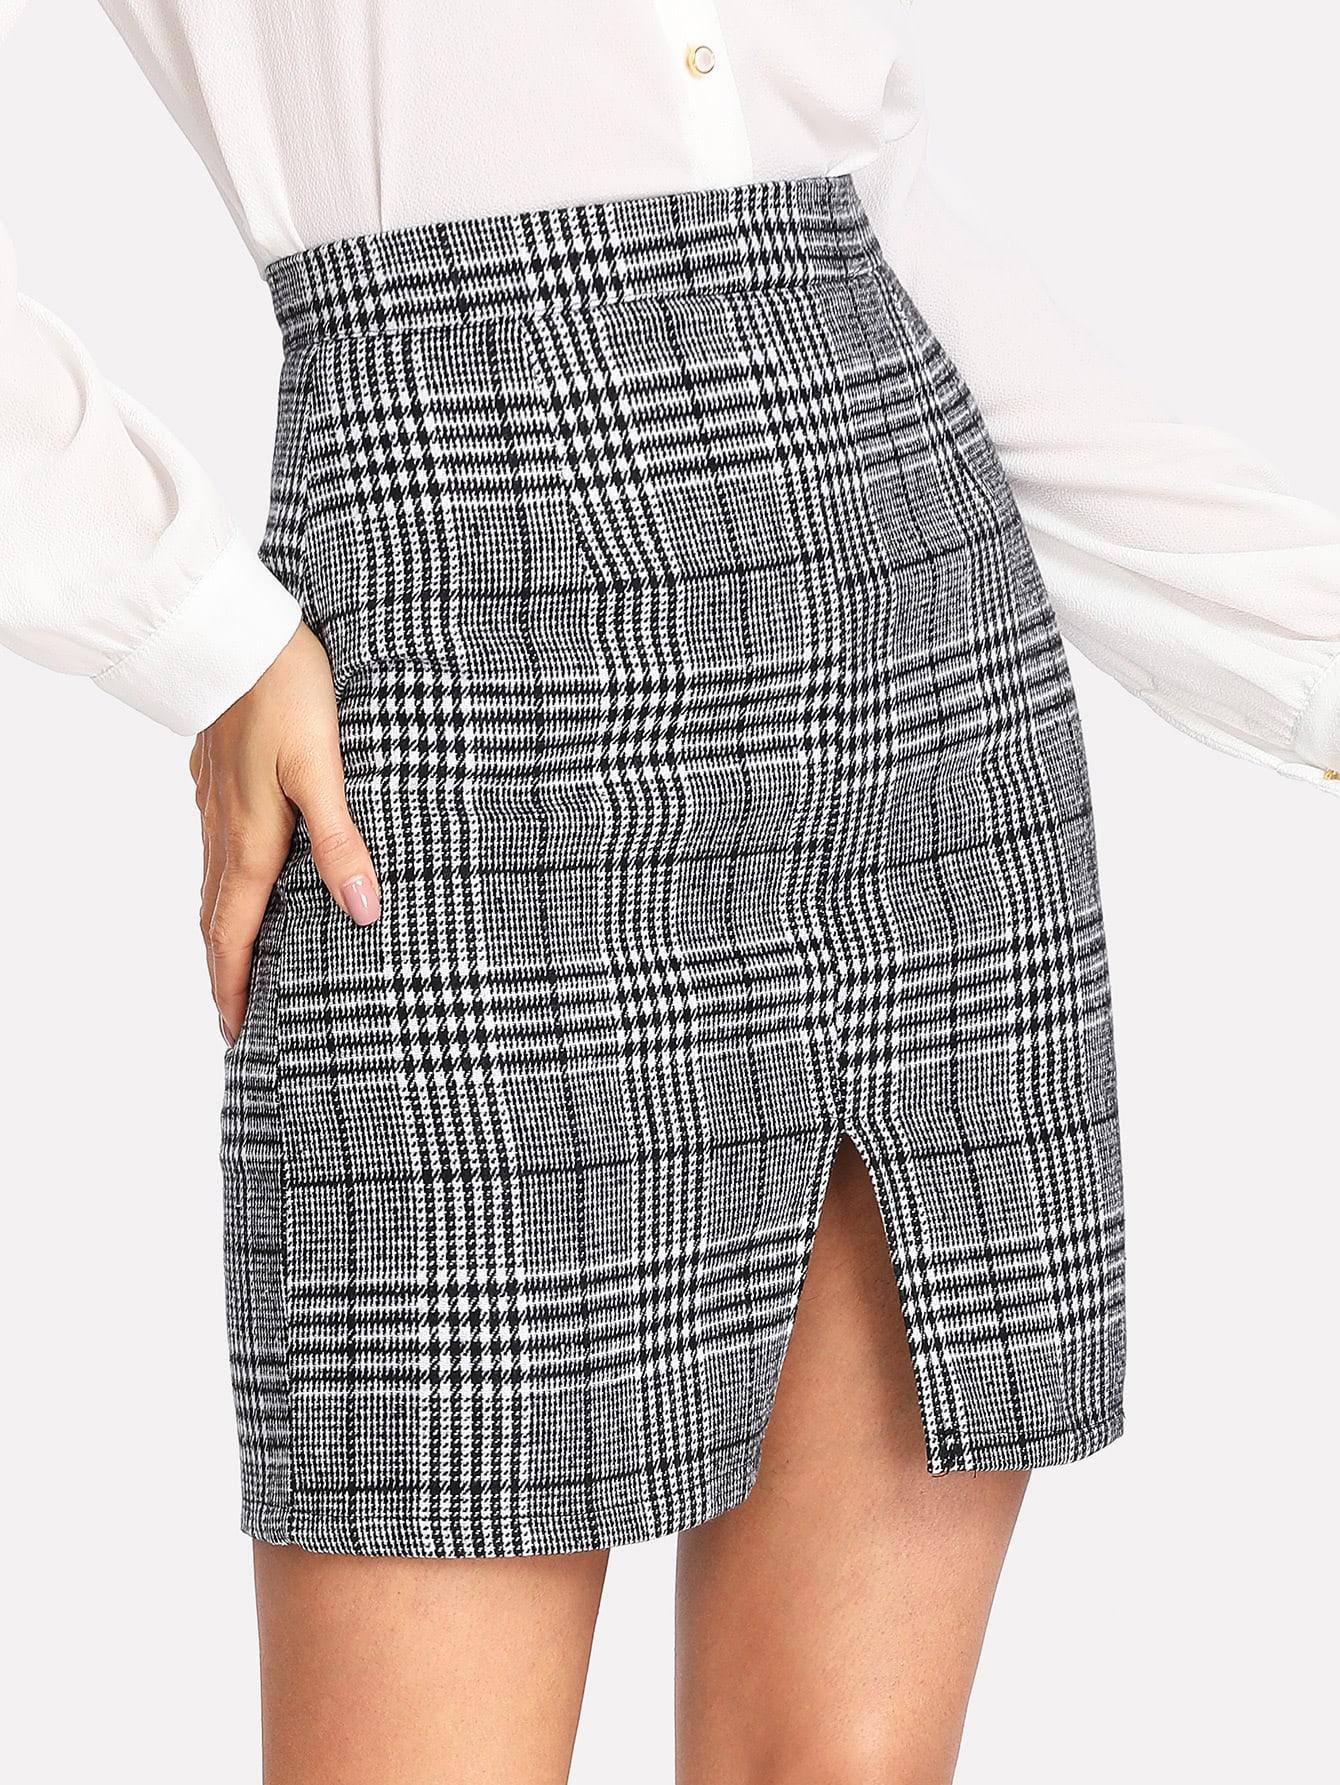 Split Front Wales Check Skirt split front wales check skirt